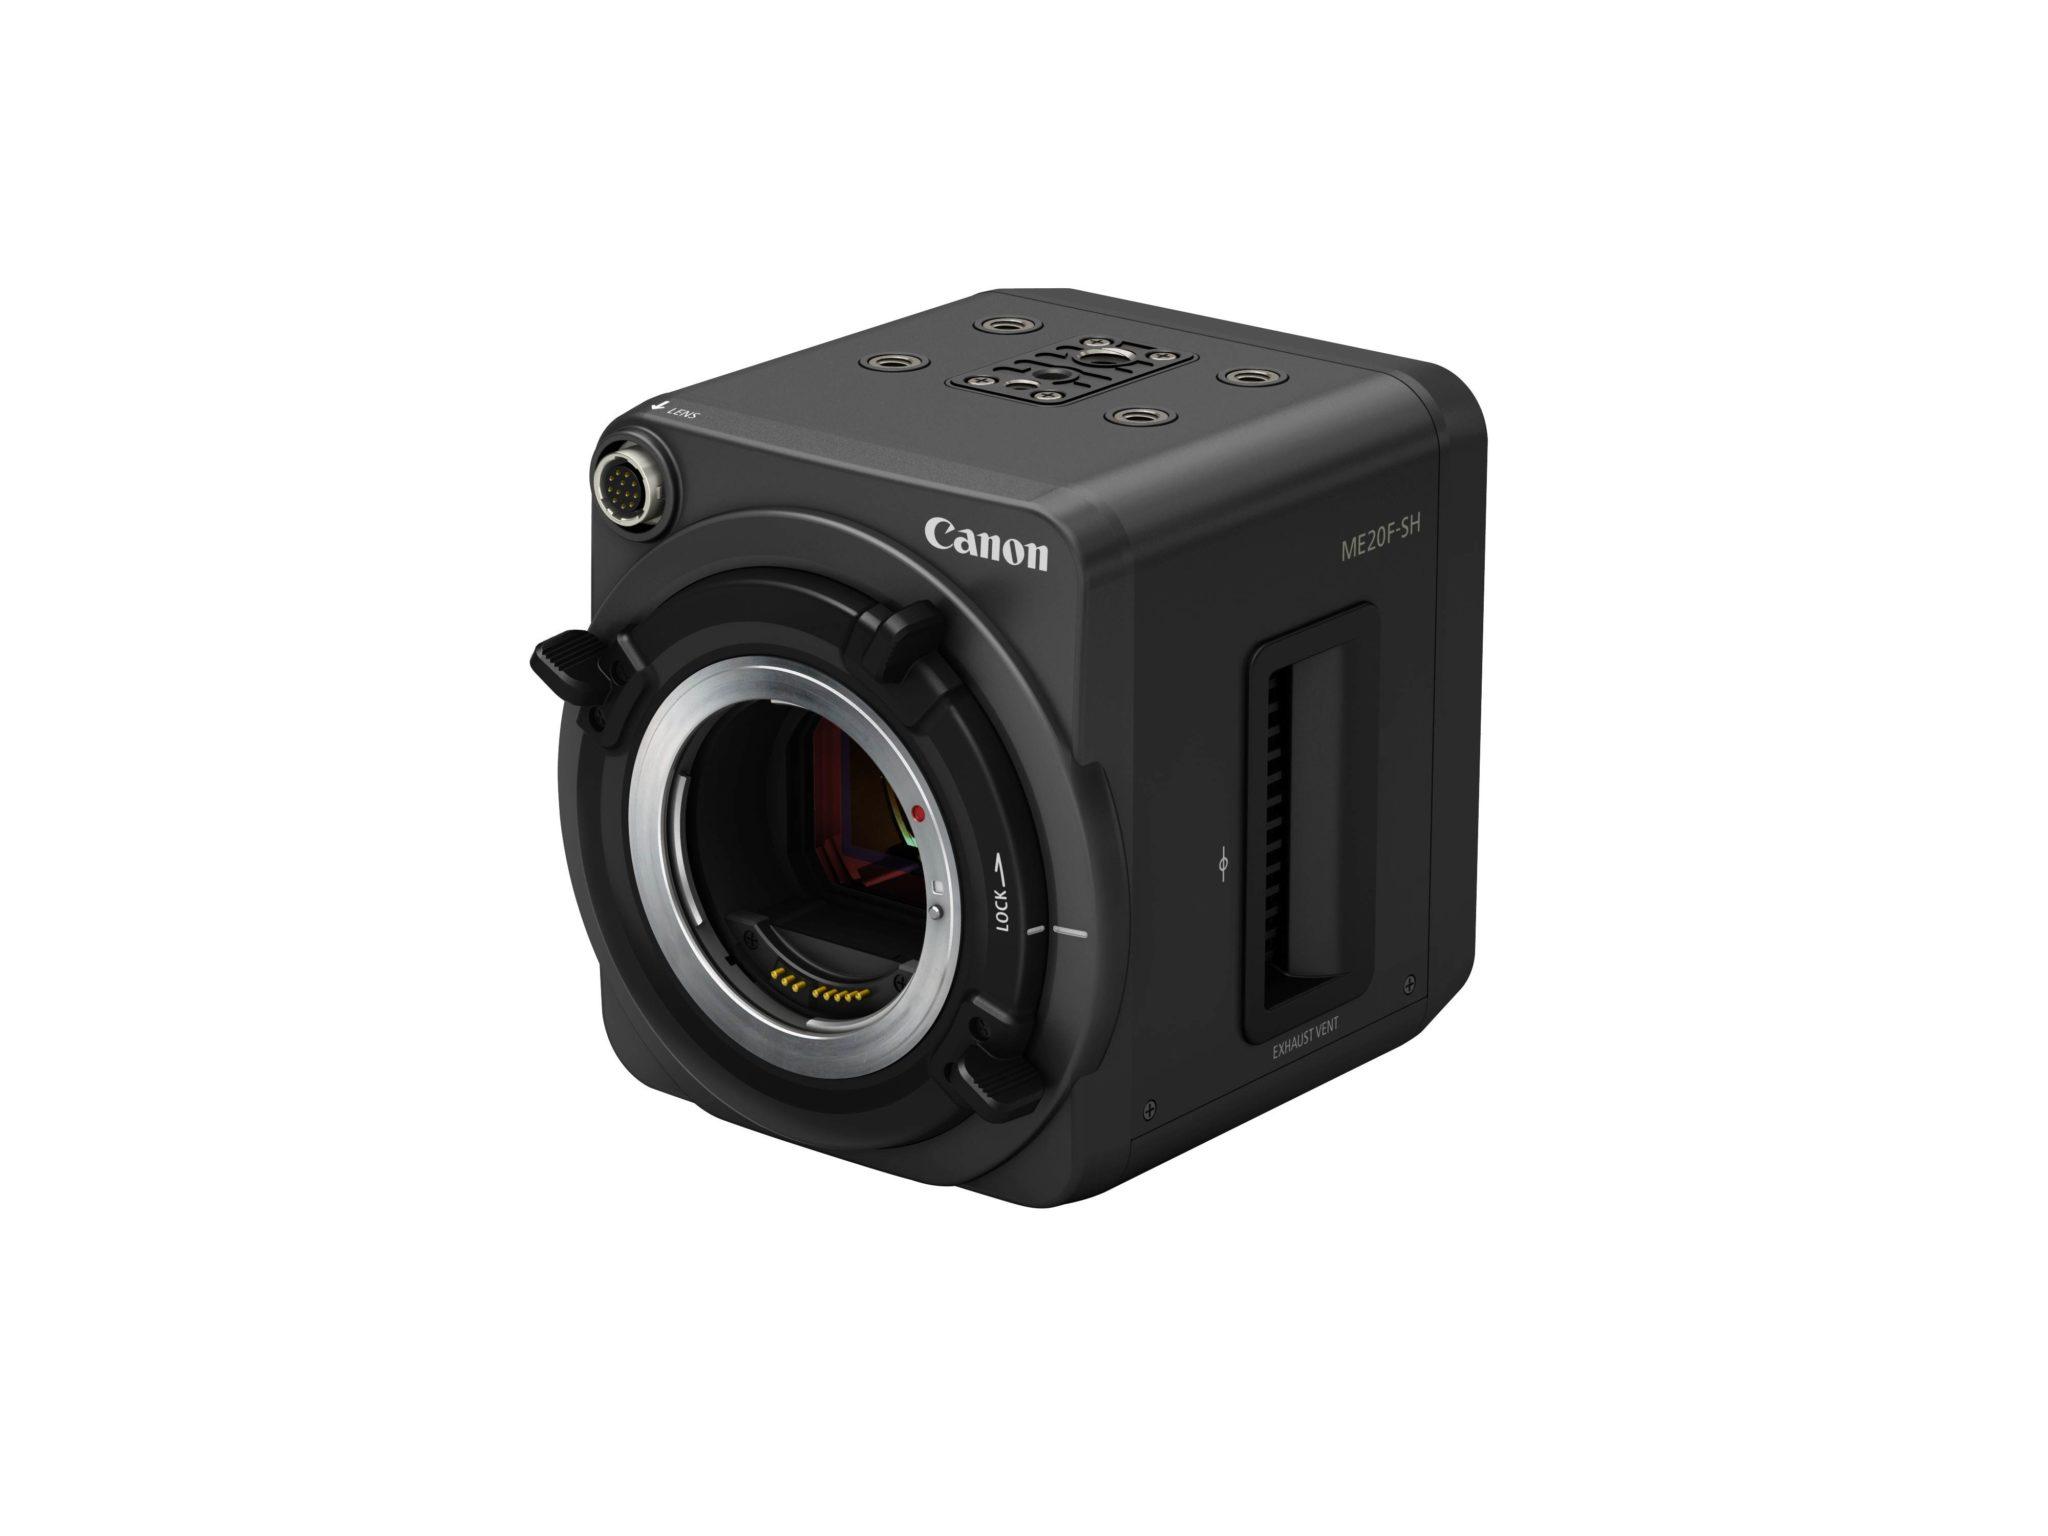 Kamera Canon ME20F